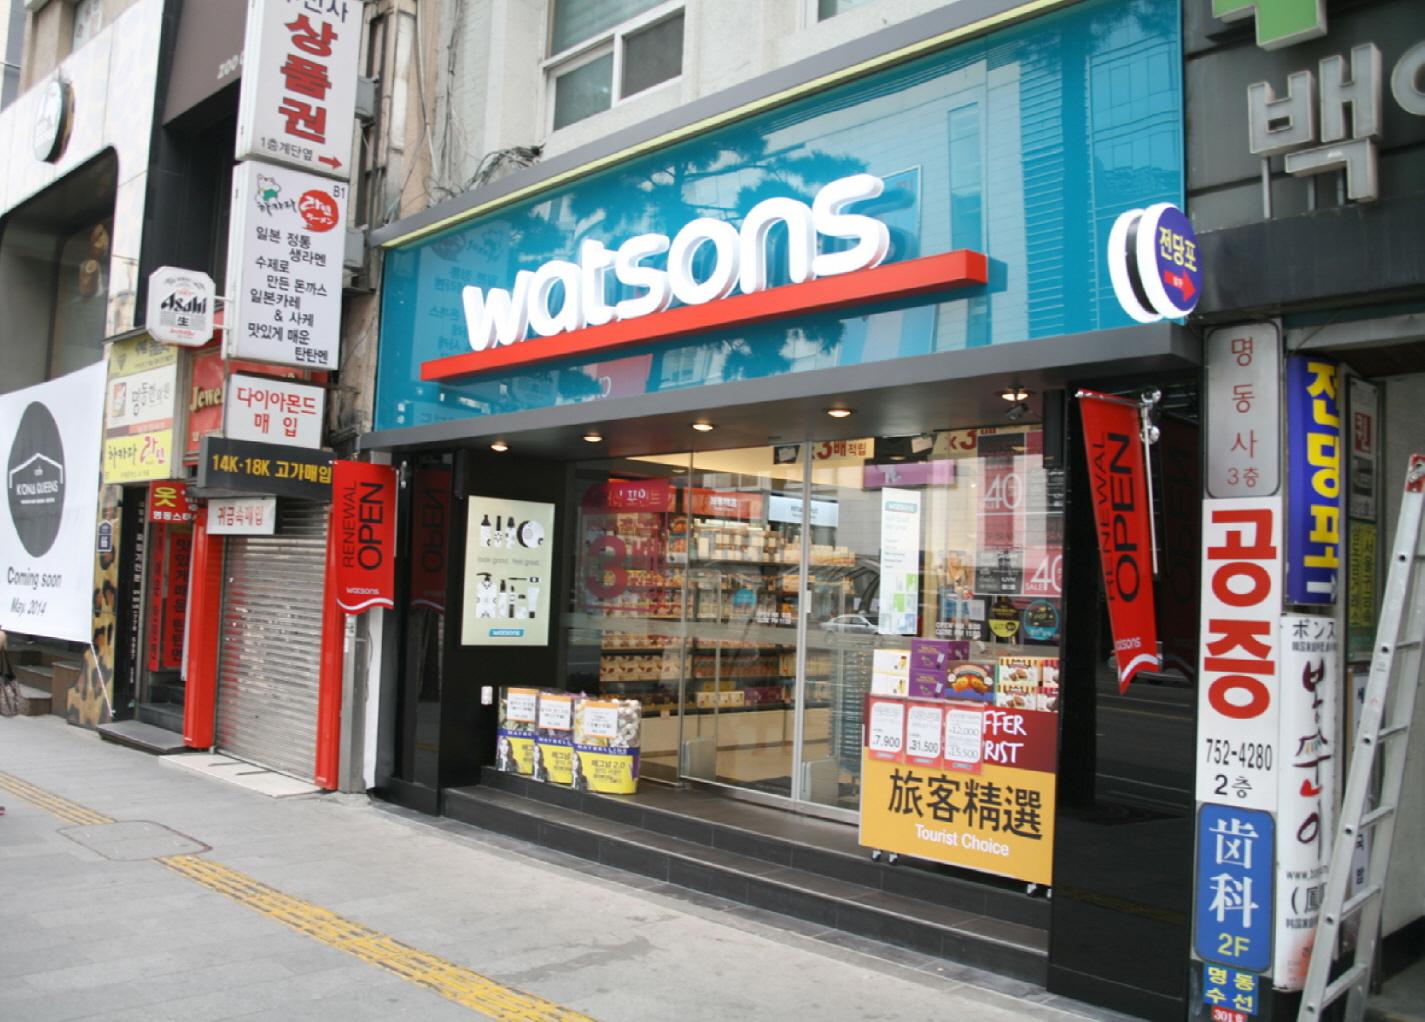 GS Watsons Korea – Myeong-dong 2(i)-ga Branch (GS왓슨스 (명동 2가점))